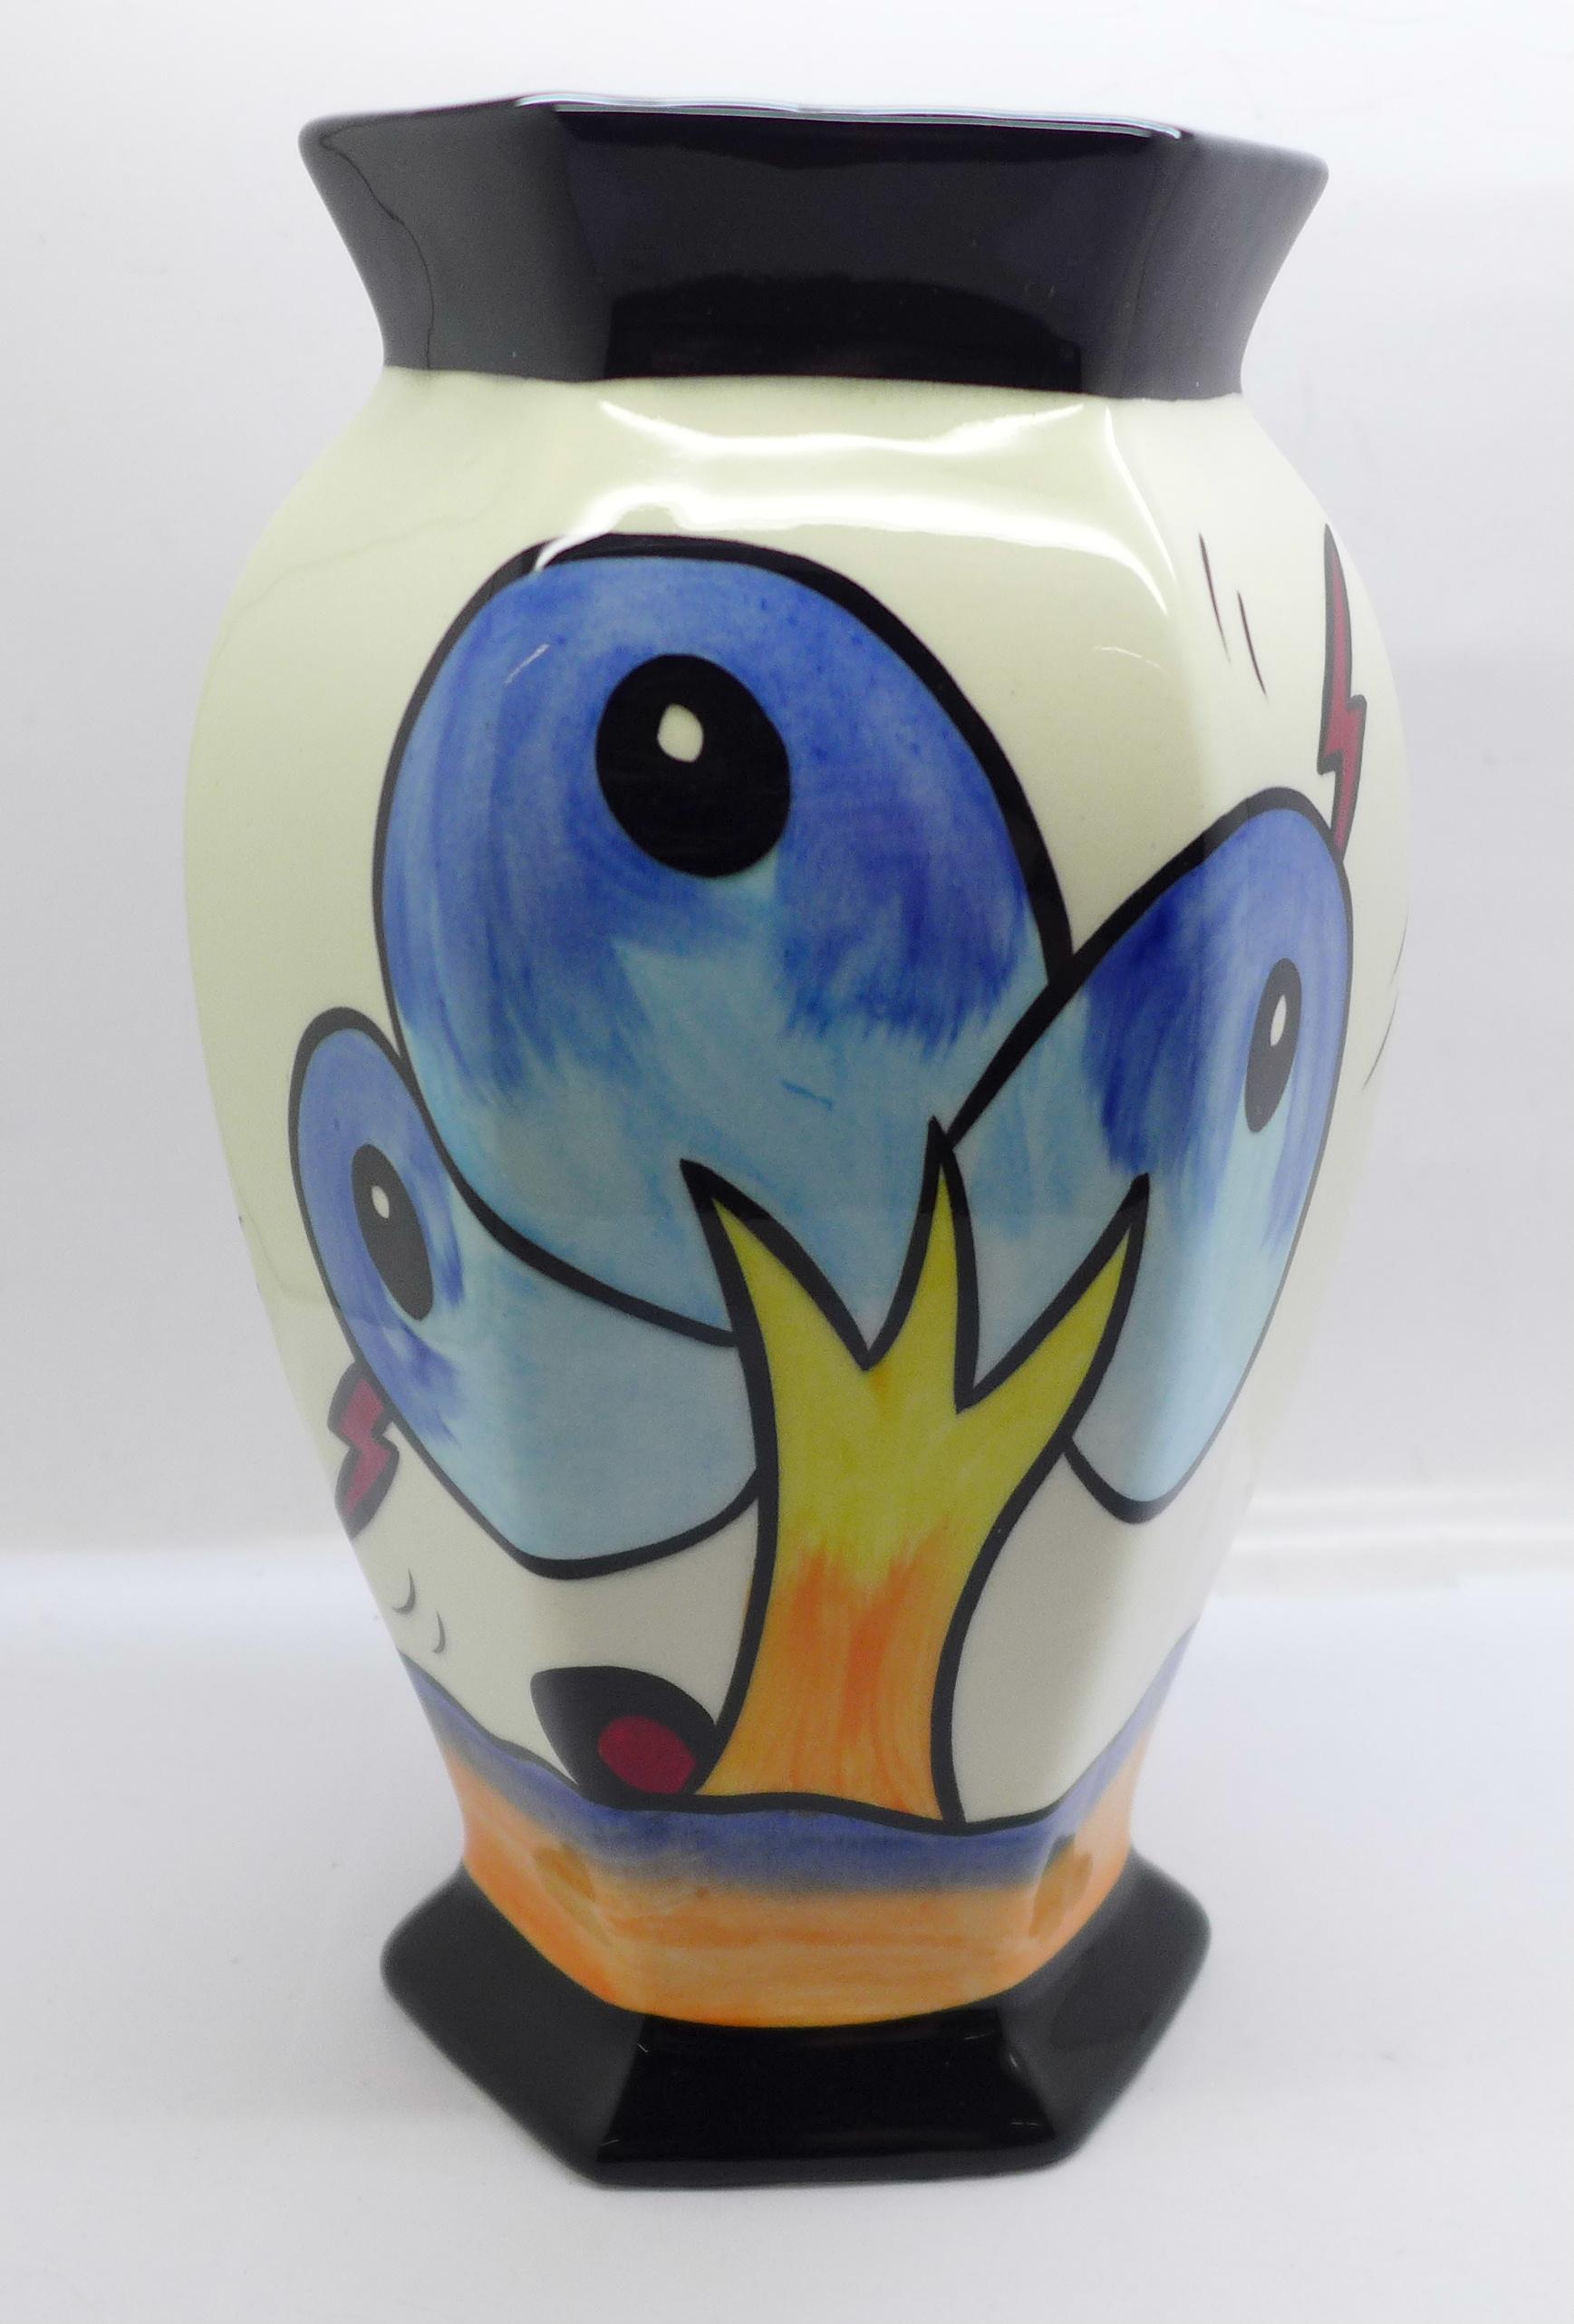 Lorna Bailey Pottery, hexagonal vase in the 'Bursley Way' design, 'Lorna Bailey' signature on the - Image 3 of 5